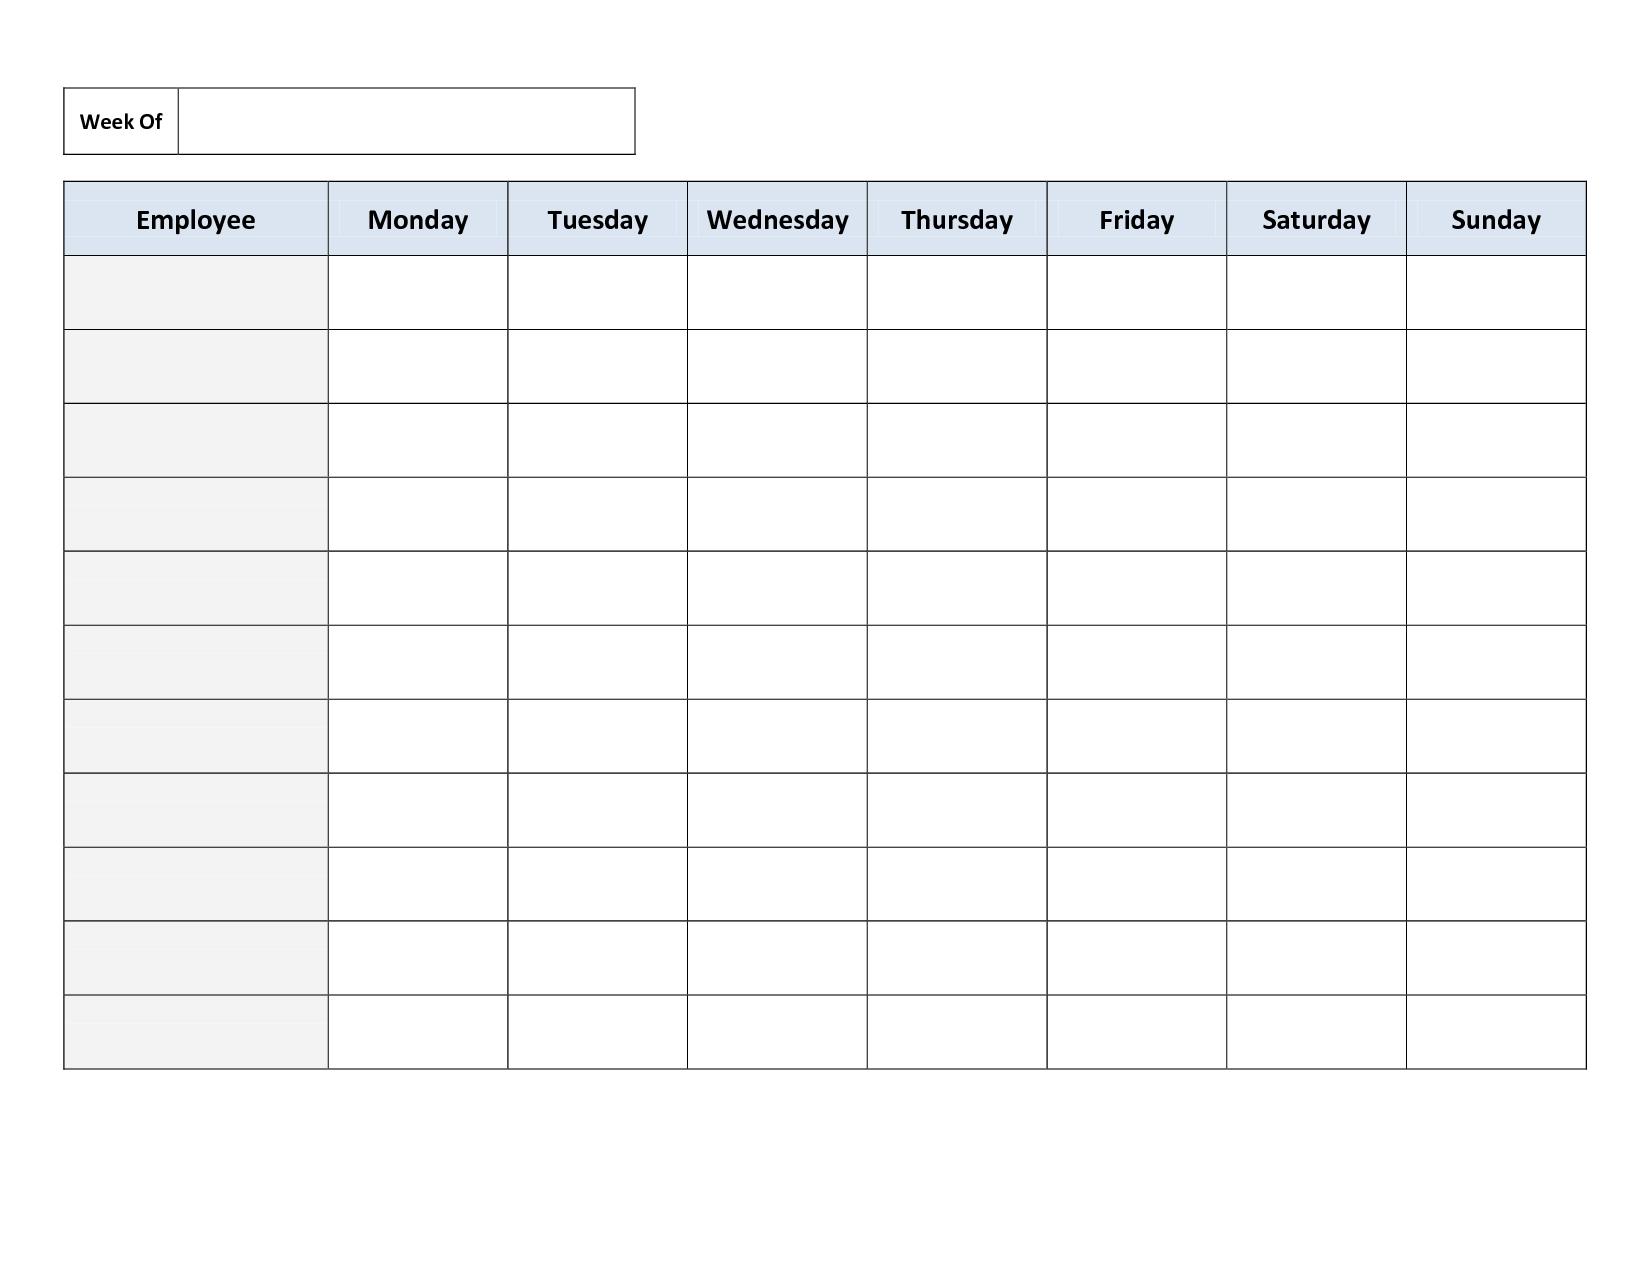 Weekly Employee Work Schedule Template. Free Blank Schedule.pdf - Free Printable Weekly Schedule